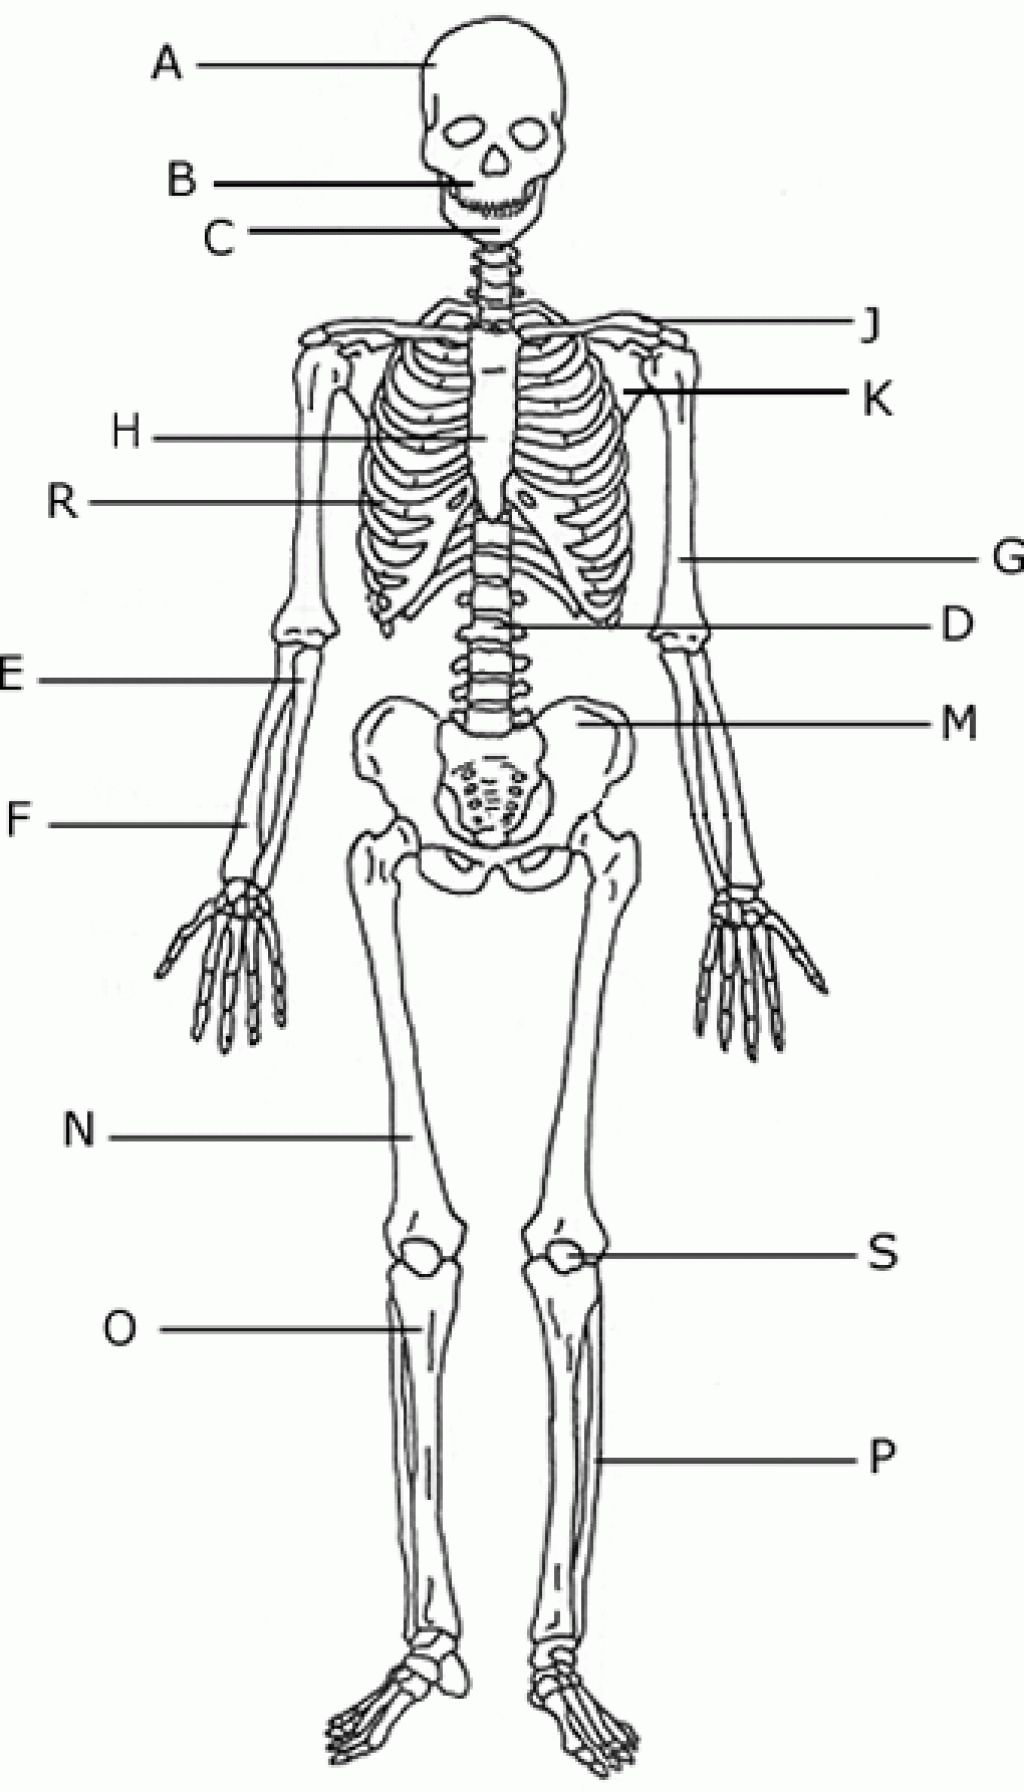 unlabeled diagram of the human skeleton unlabeled diagram of the human skeleton system skeletal anatomy [ 1024 x 1792 Pixel ]